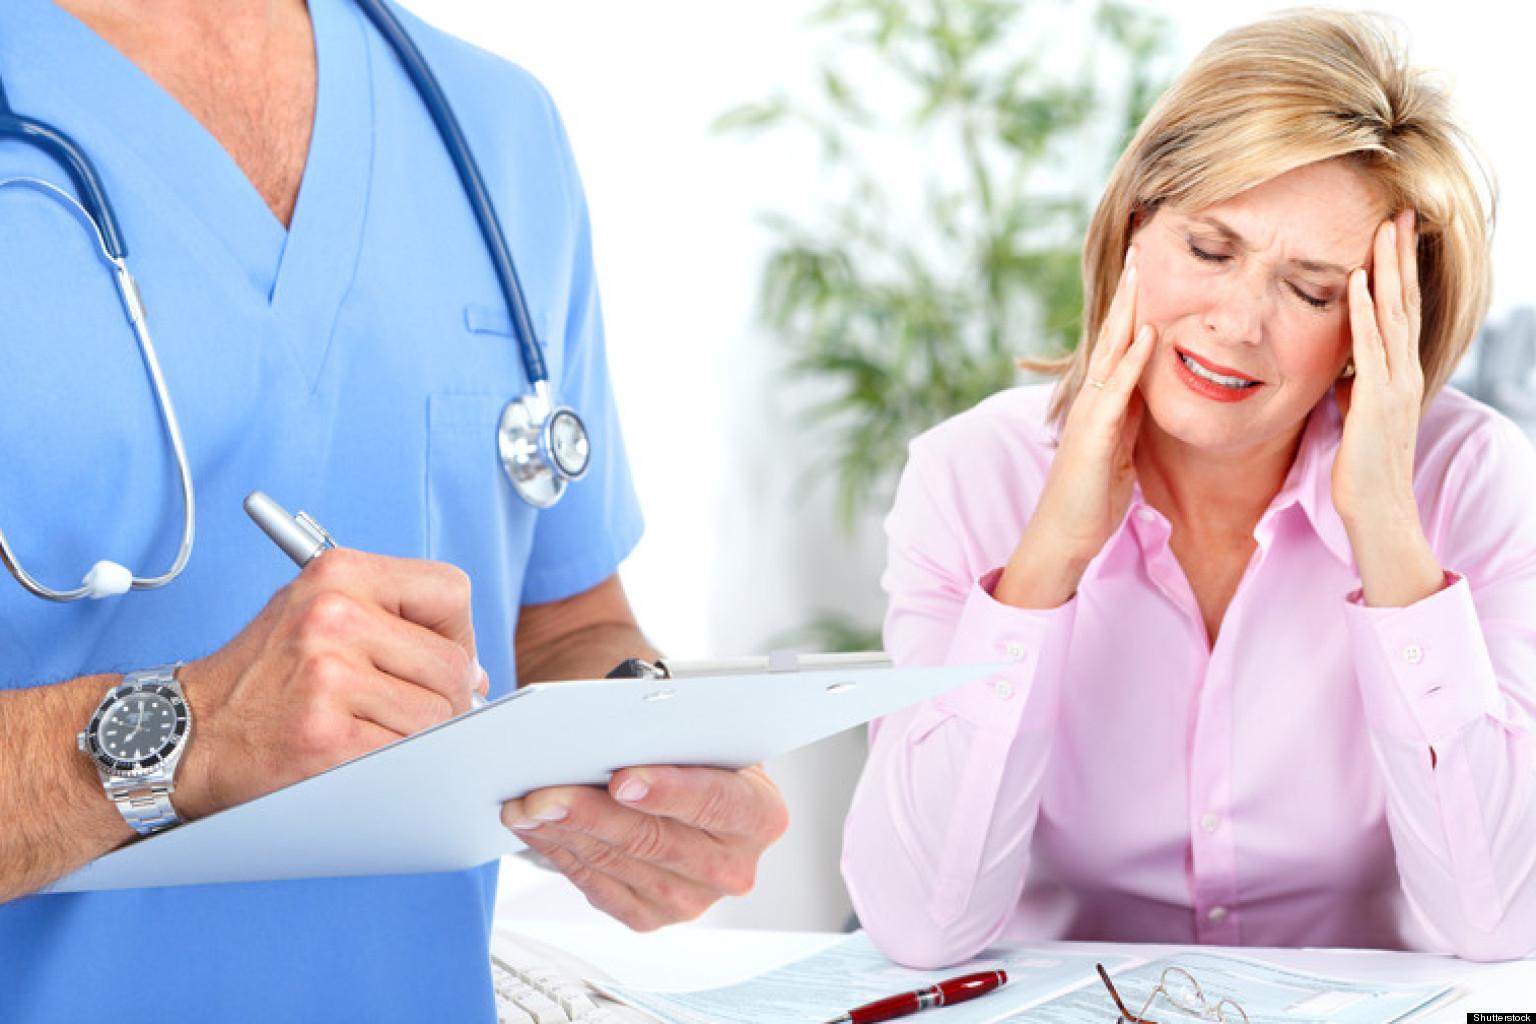 консультация врача диетолога онлайн